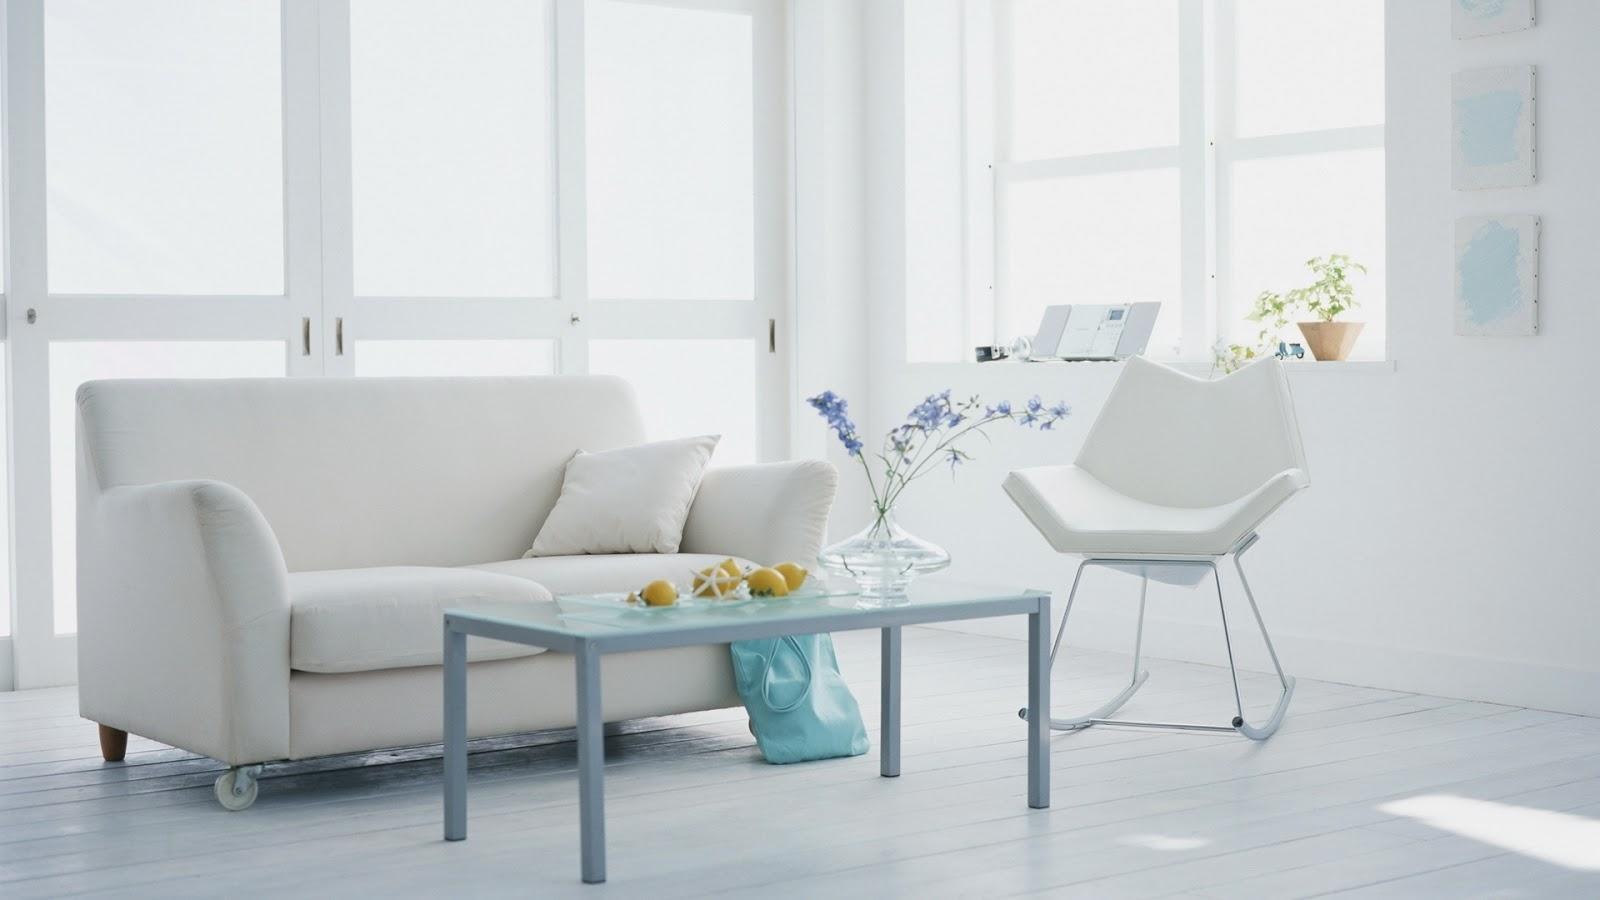 http://4.bp.blogspot.com/-yWas5HyUnuk/UMr5thRDFJI/AAAAAAAAJ80/GotJu18zEYs/s1600/bright-white-room.jpg